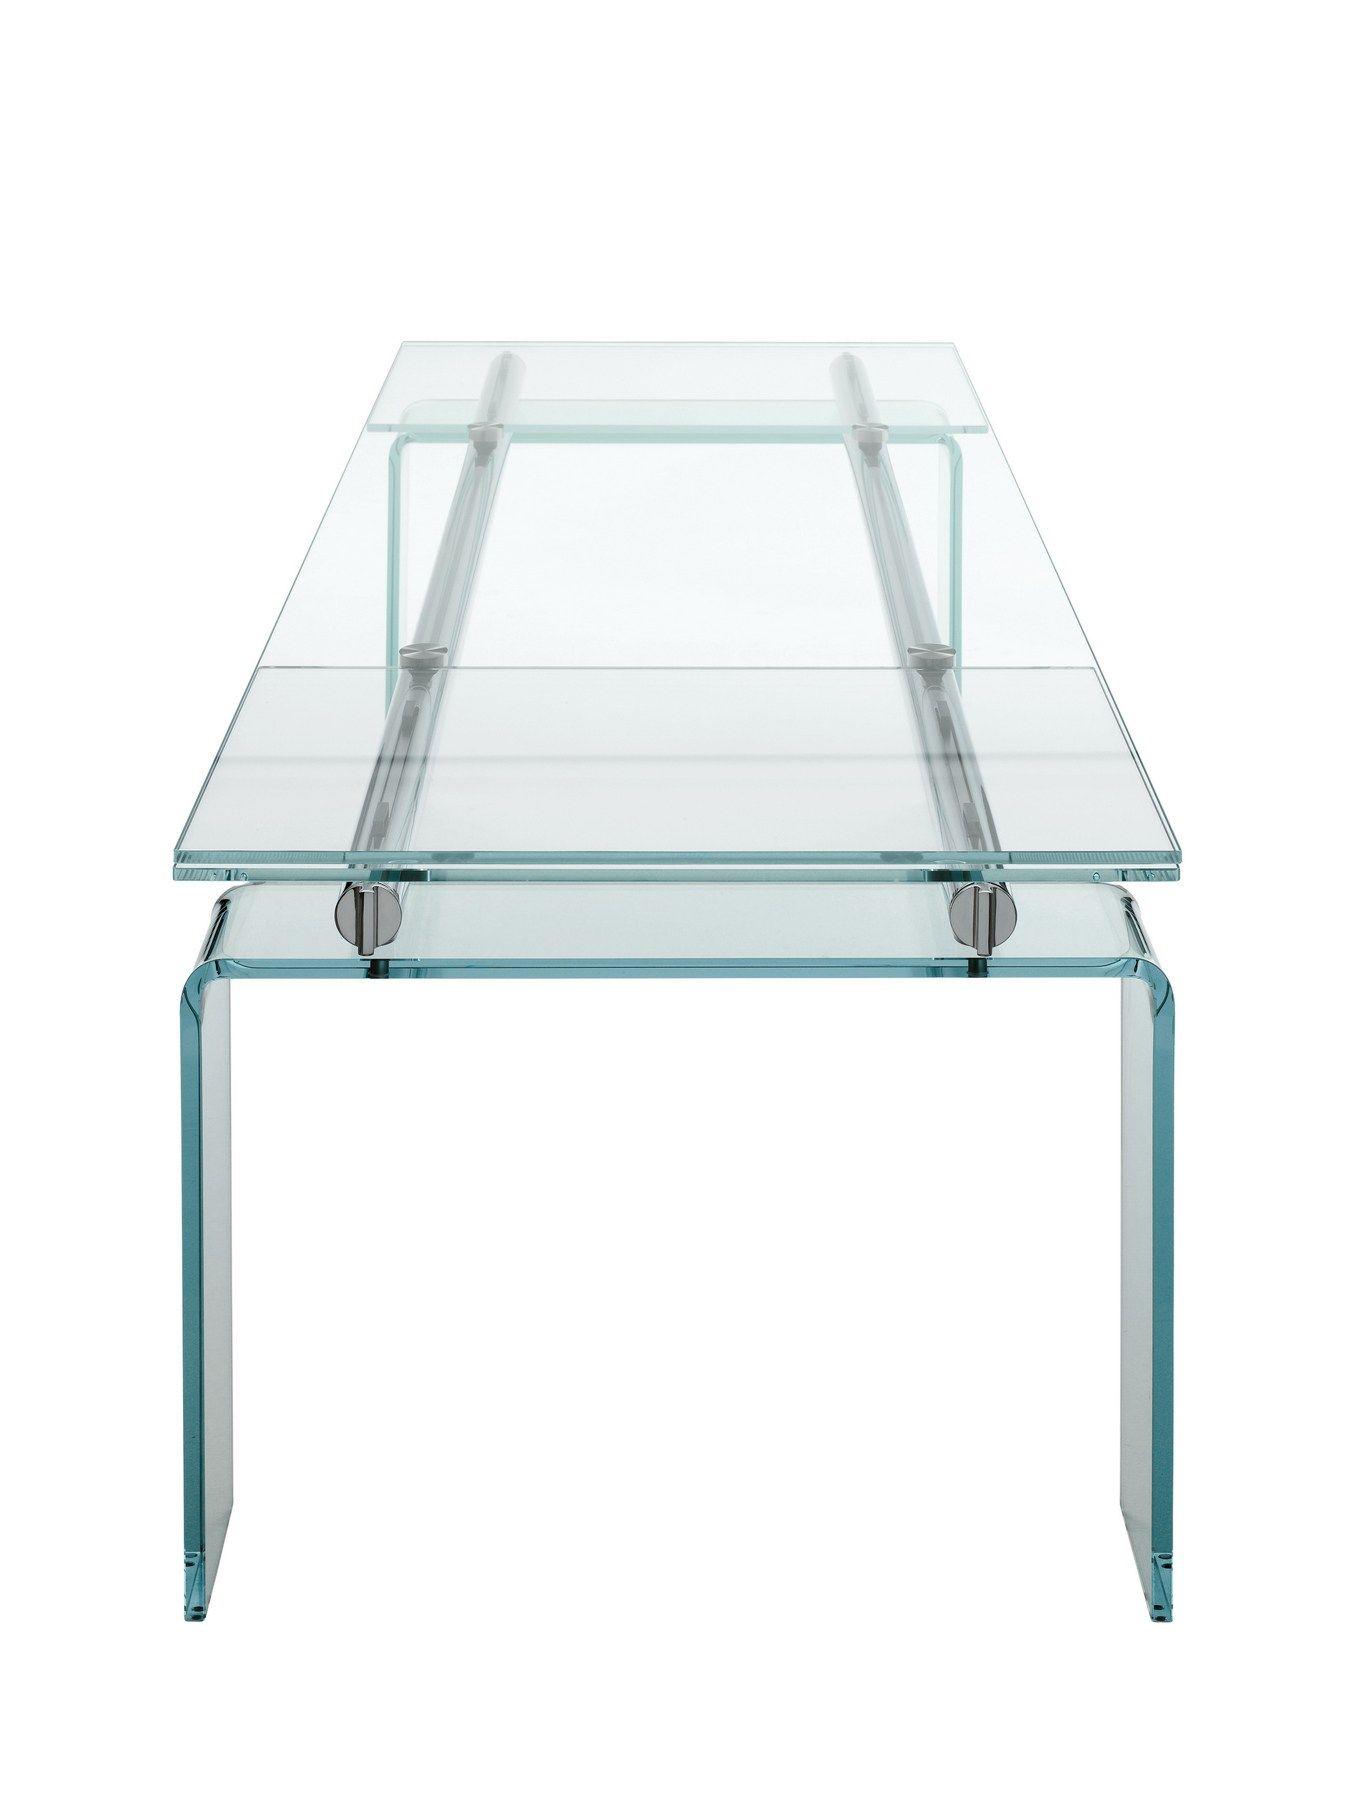 Extending crystal table stilt glass by desalto design decoma design - Extending table ...